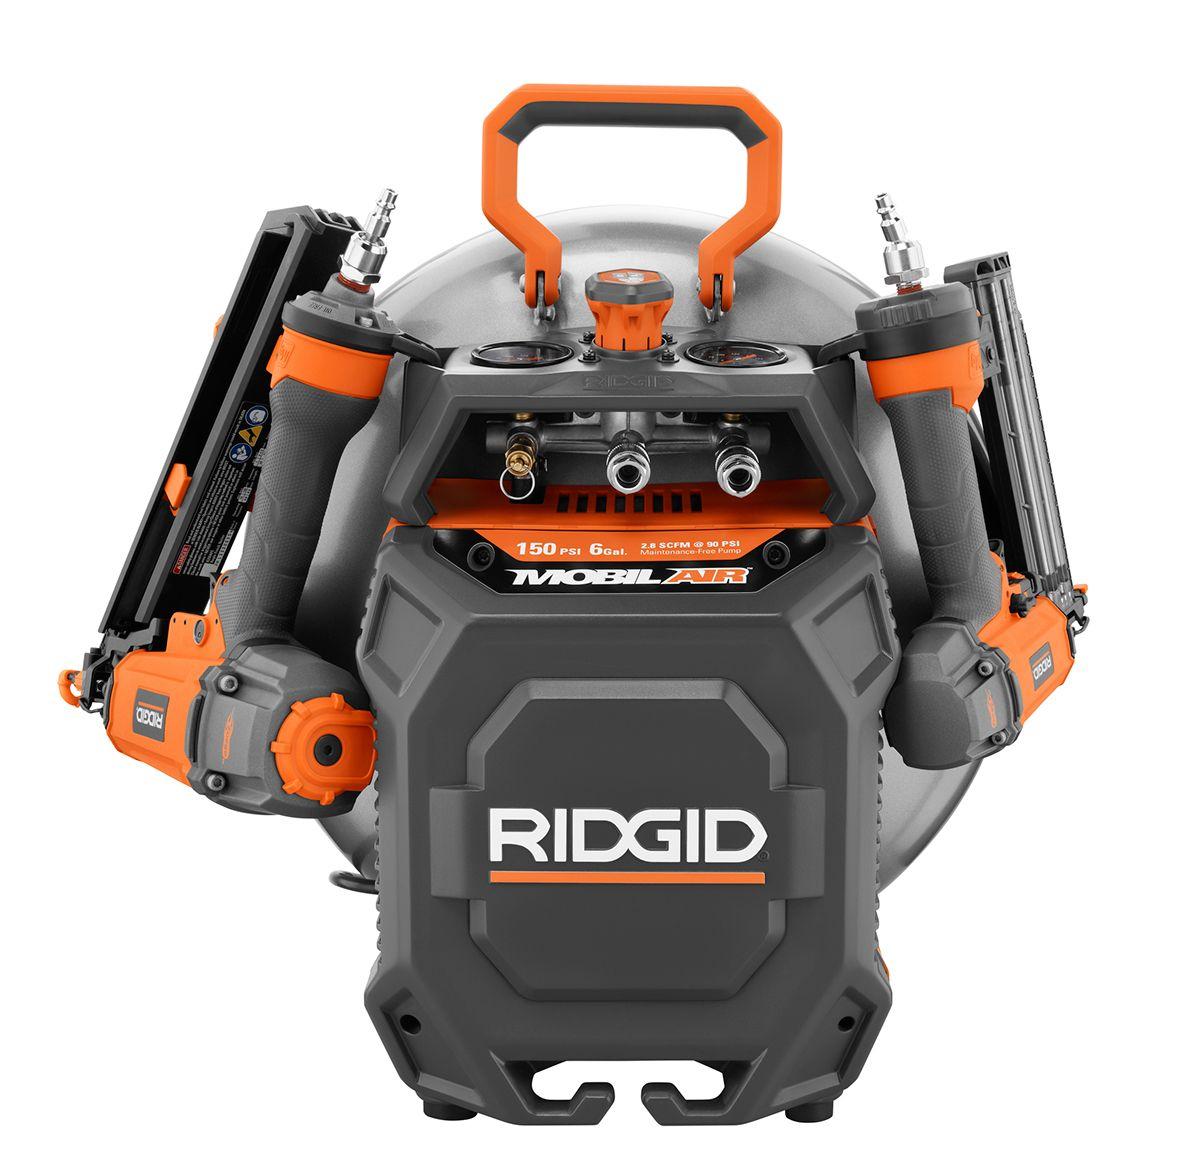 Introducing the New RIDGID 6 Gal. Vertical Compressor